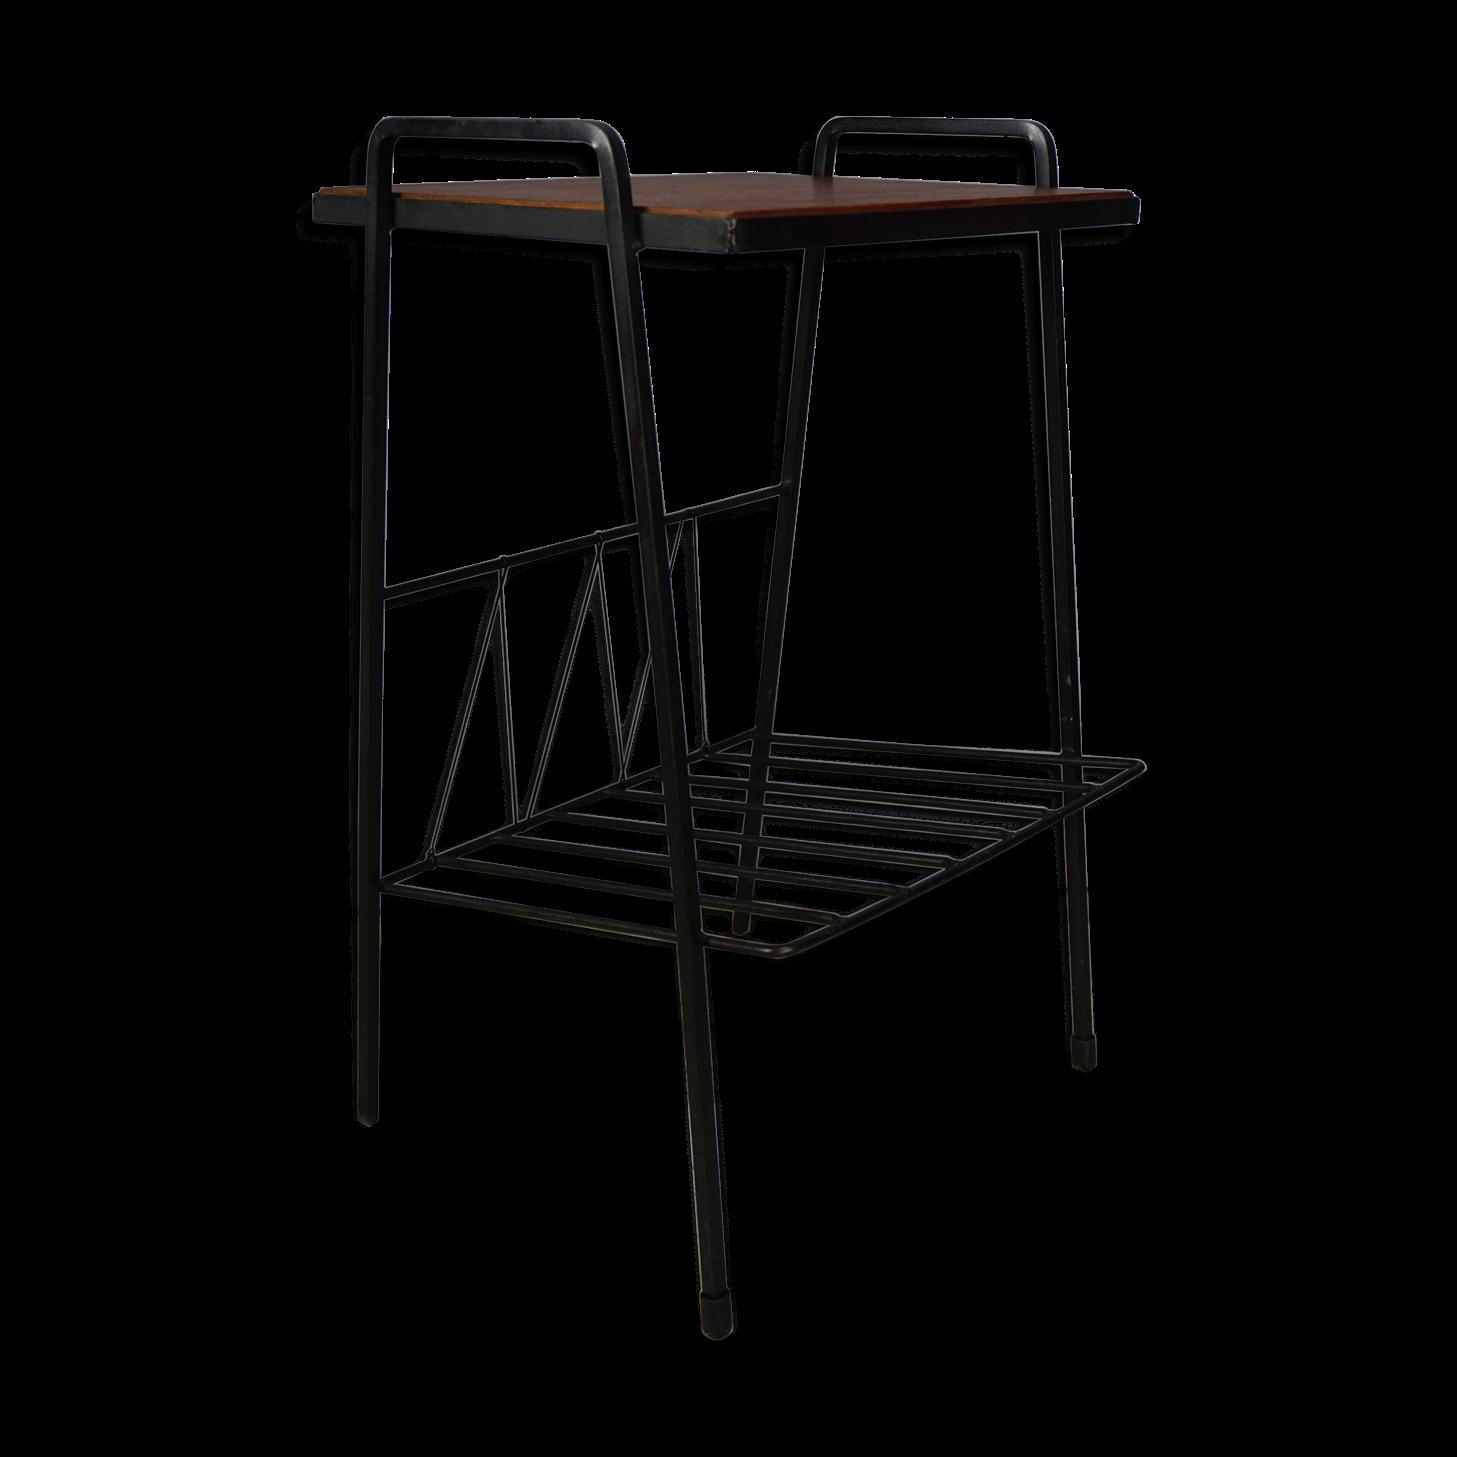 table d appoint cuivre table duappoint design en. Black Bedroom Furniture Sets. Home Design Ideas